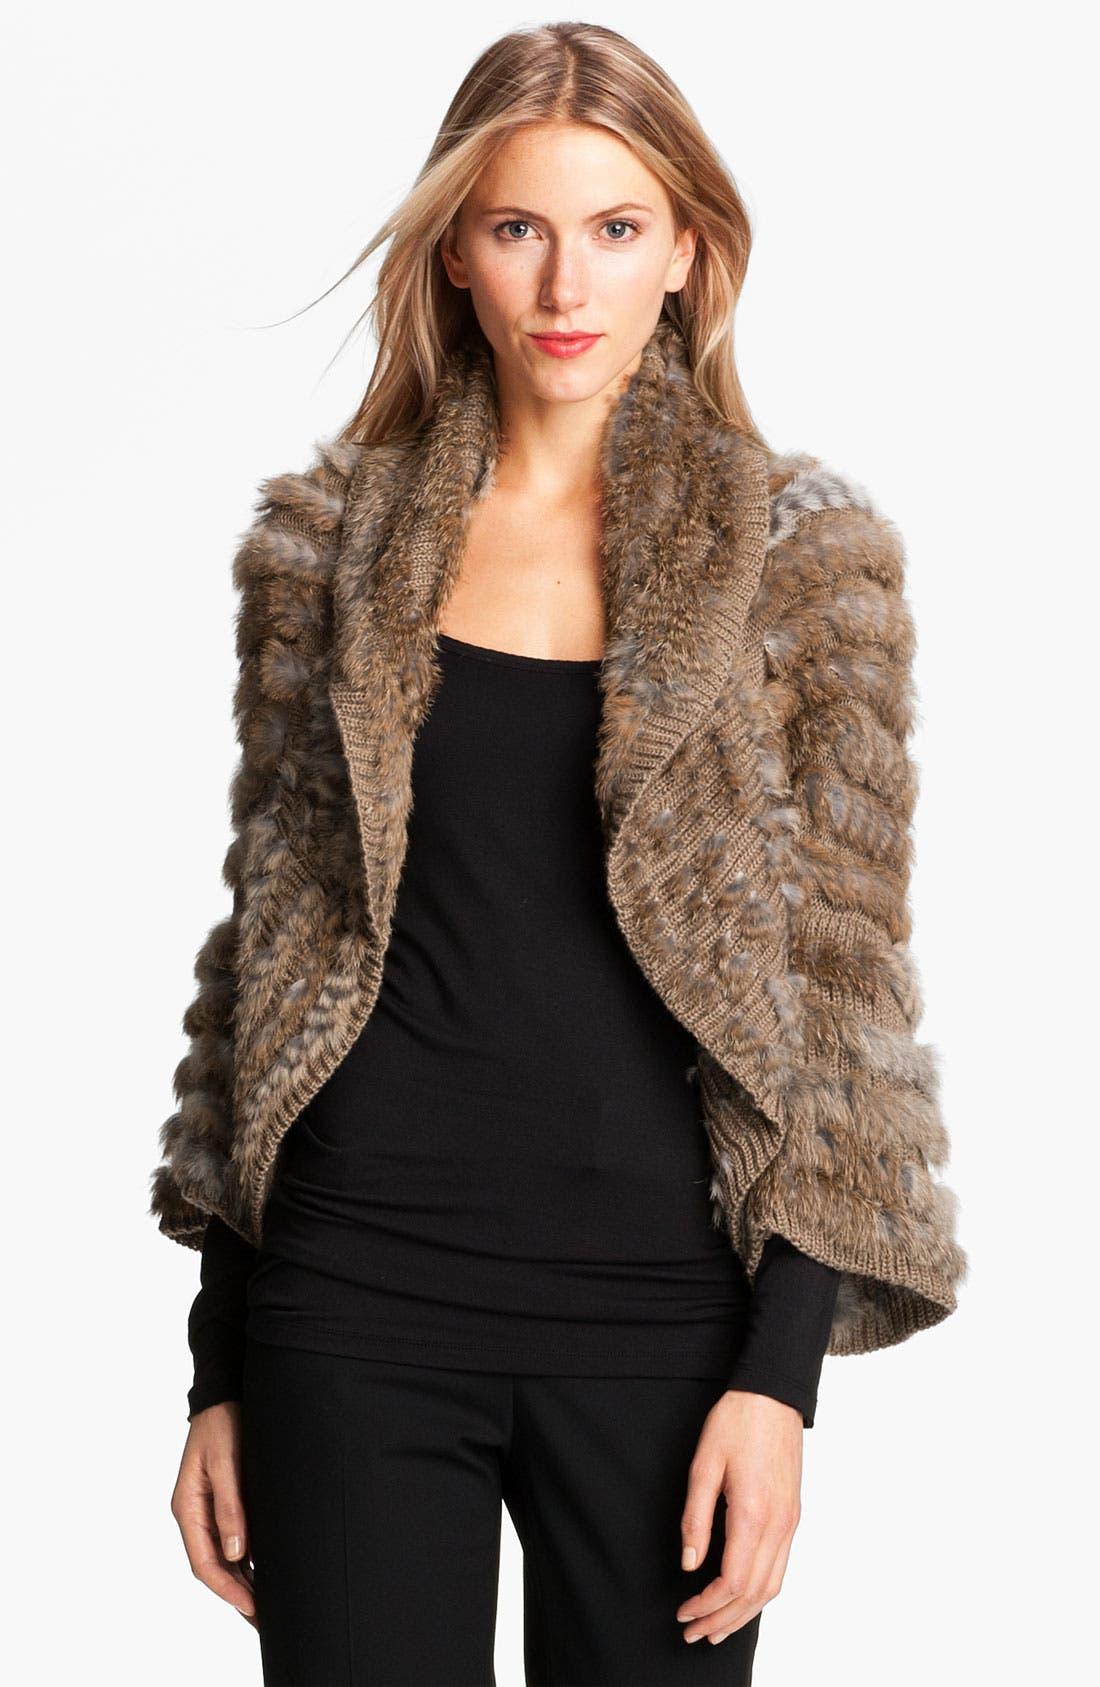 Alternate Image 1 Selected - Alberto Makali Knit & Genuine Rabbit Fur Shrug